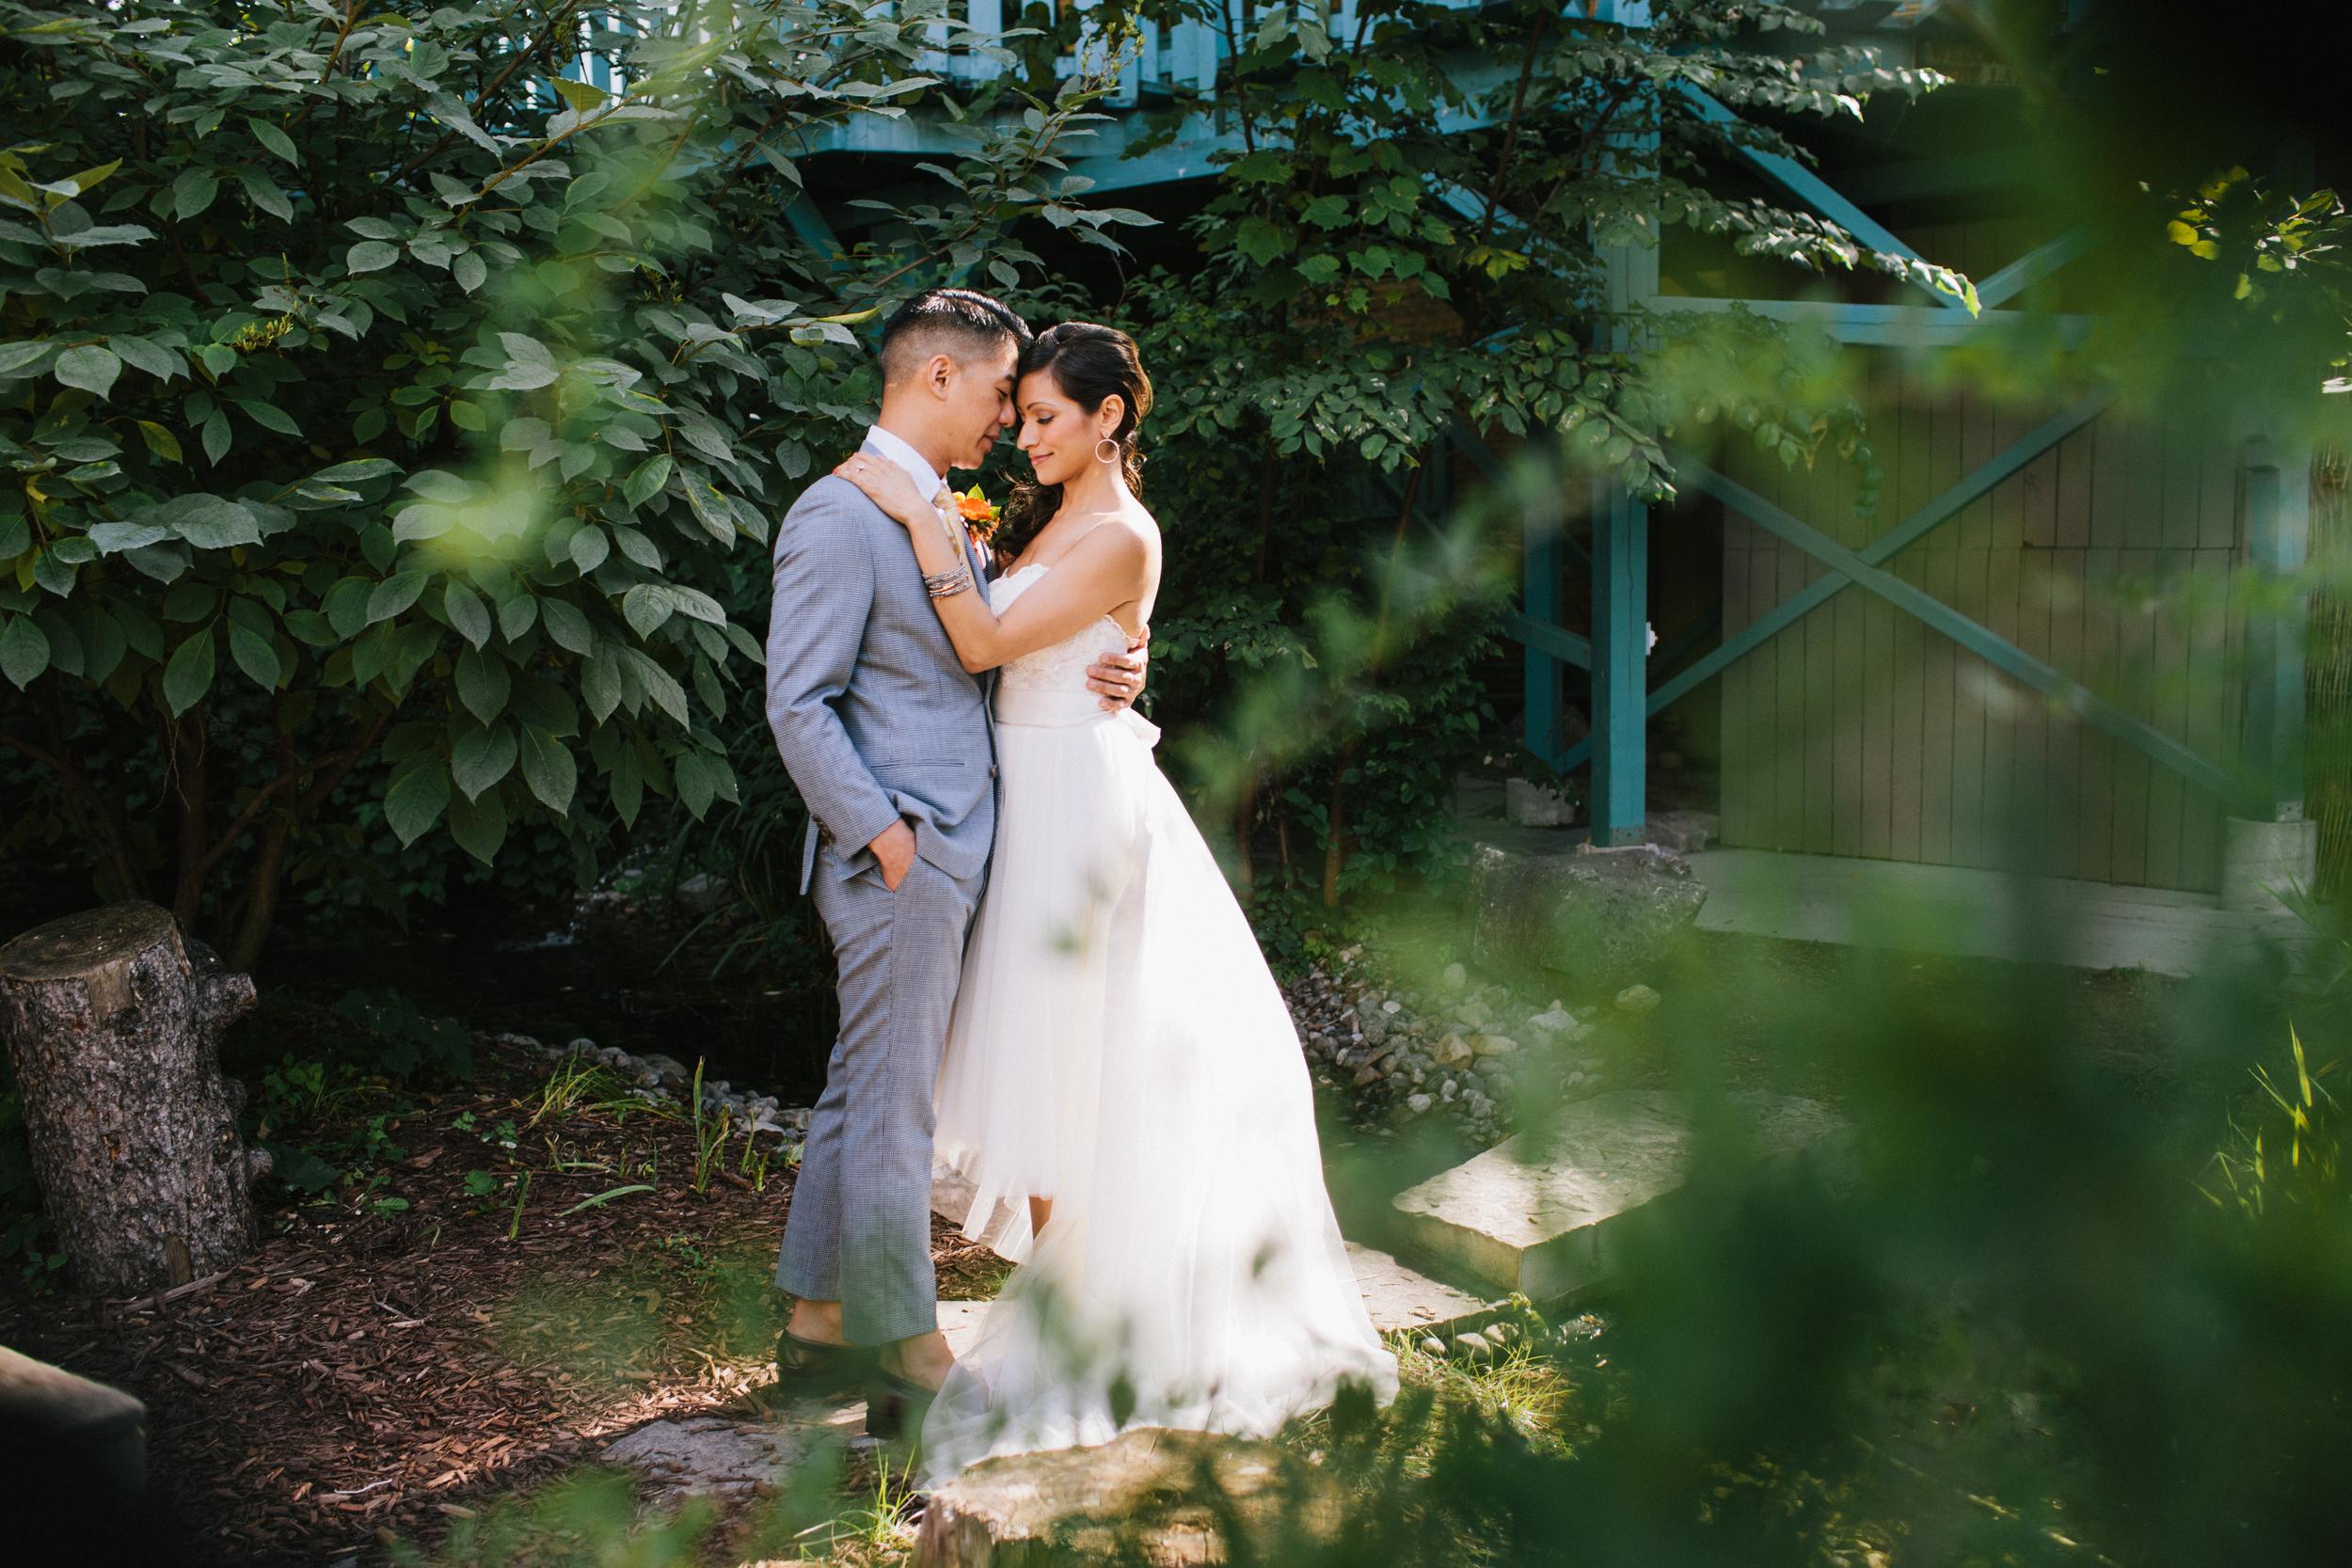 Berkeley-field-house-wedding-nicola-ken-049.jpg